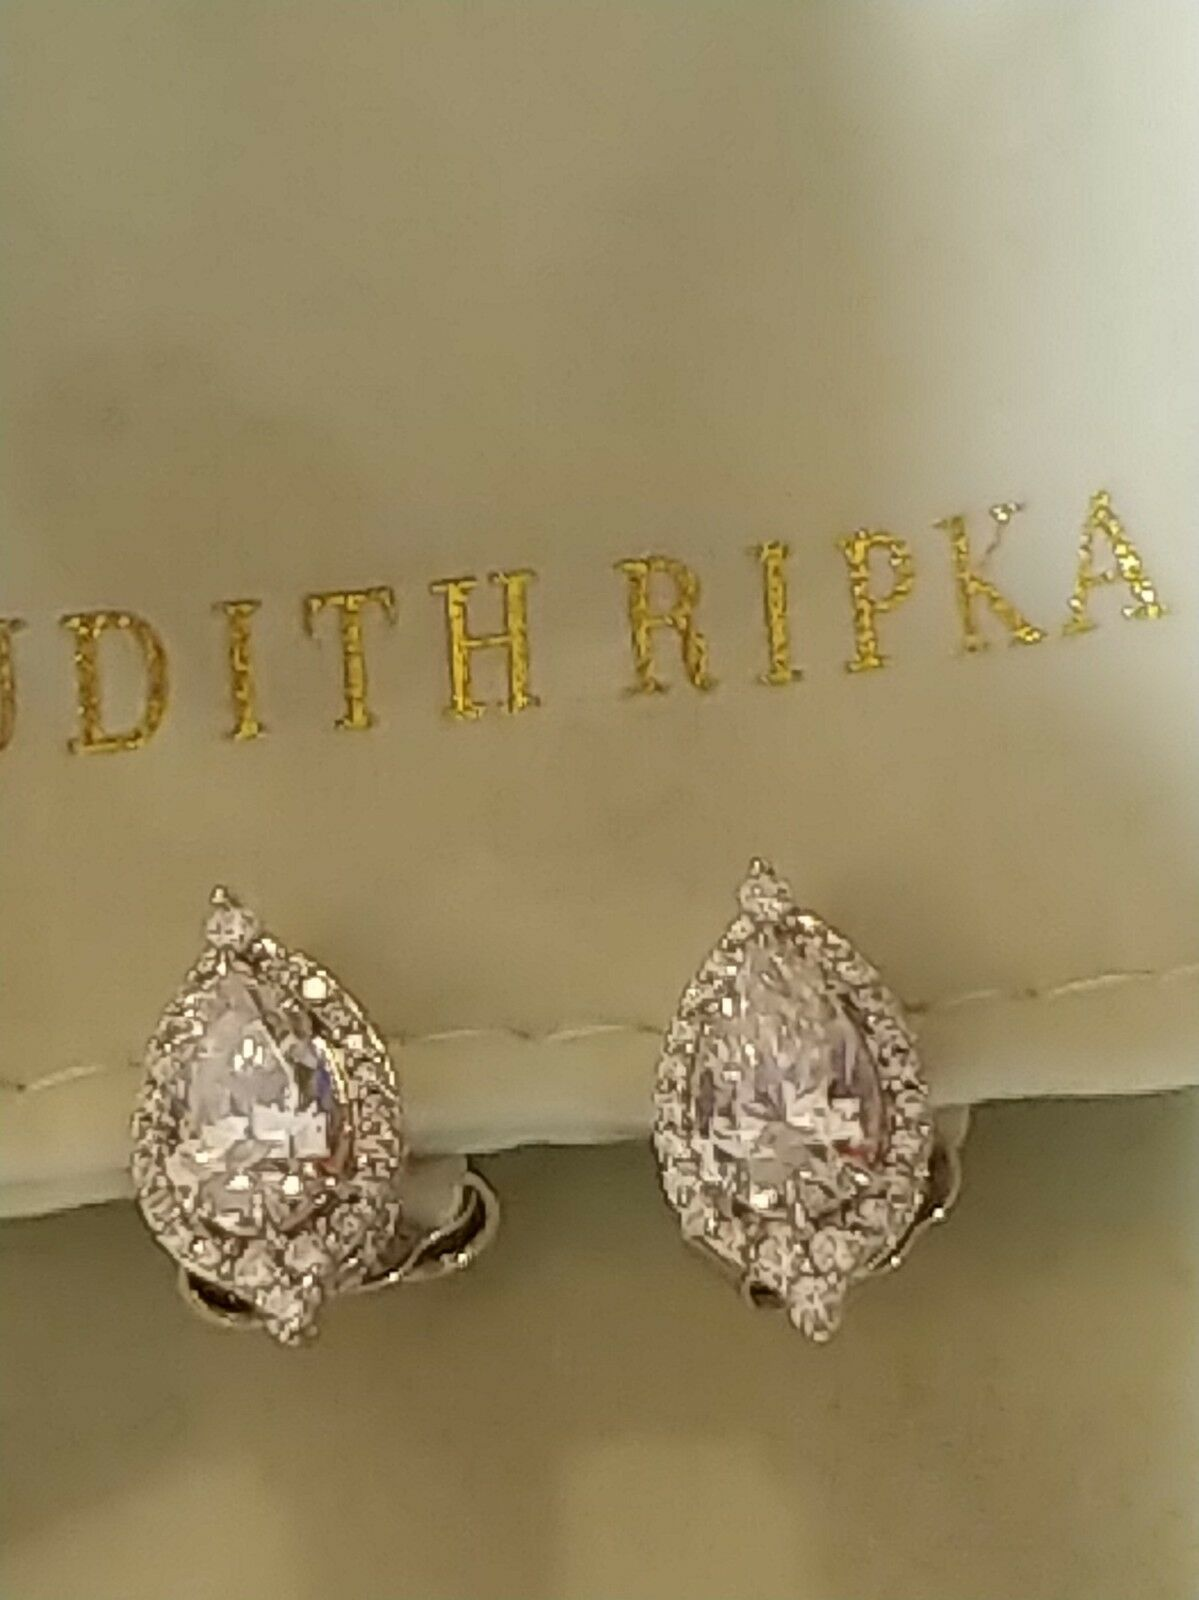 4201bb44238fe Diamonique Pear Ripka Judith New Halo Earrings Stud svep7d0d46124 ...